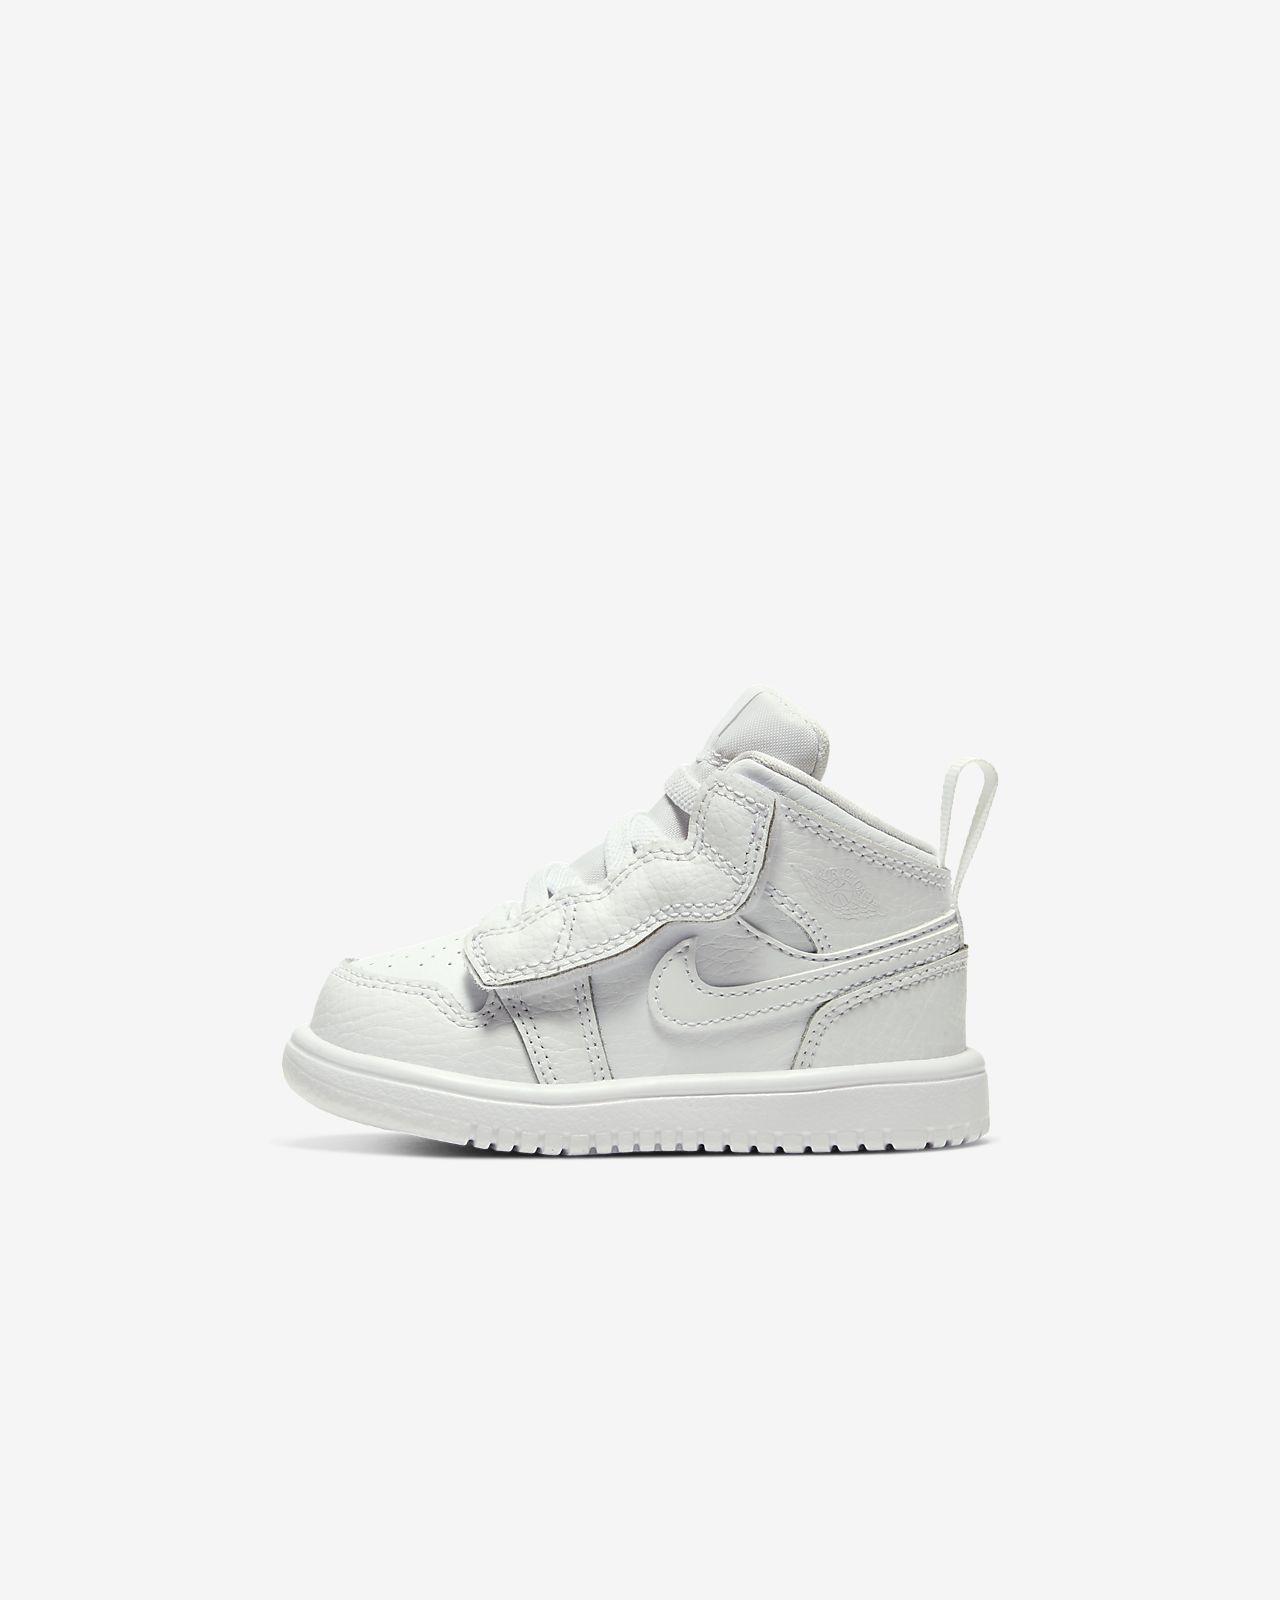 Buty dla niemowląt Air Jordan 1 Mid Alt